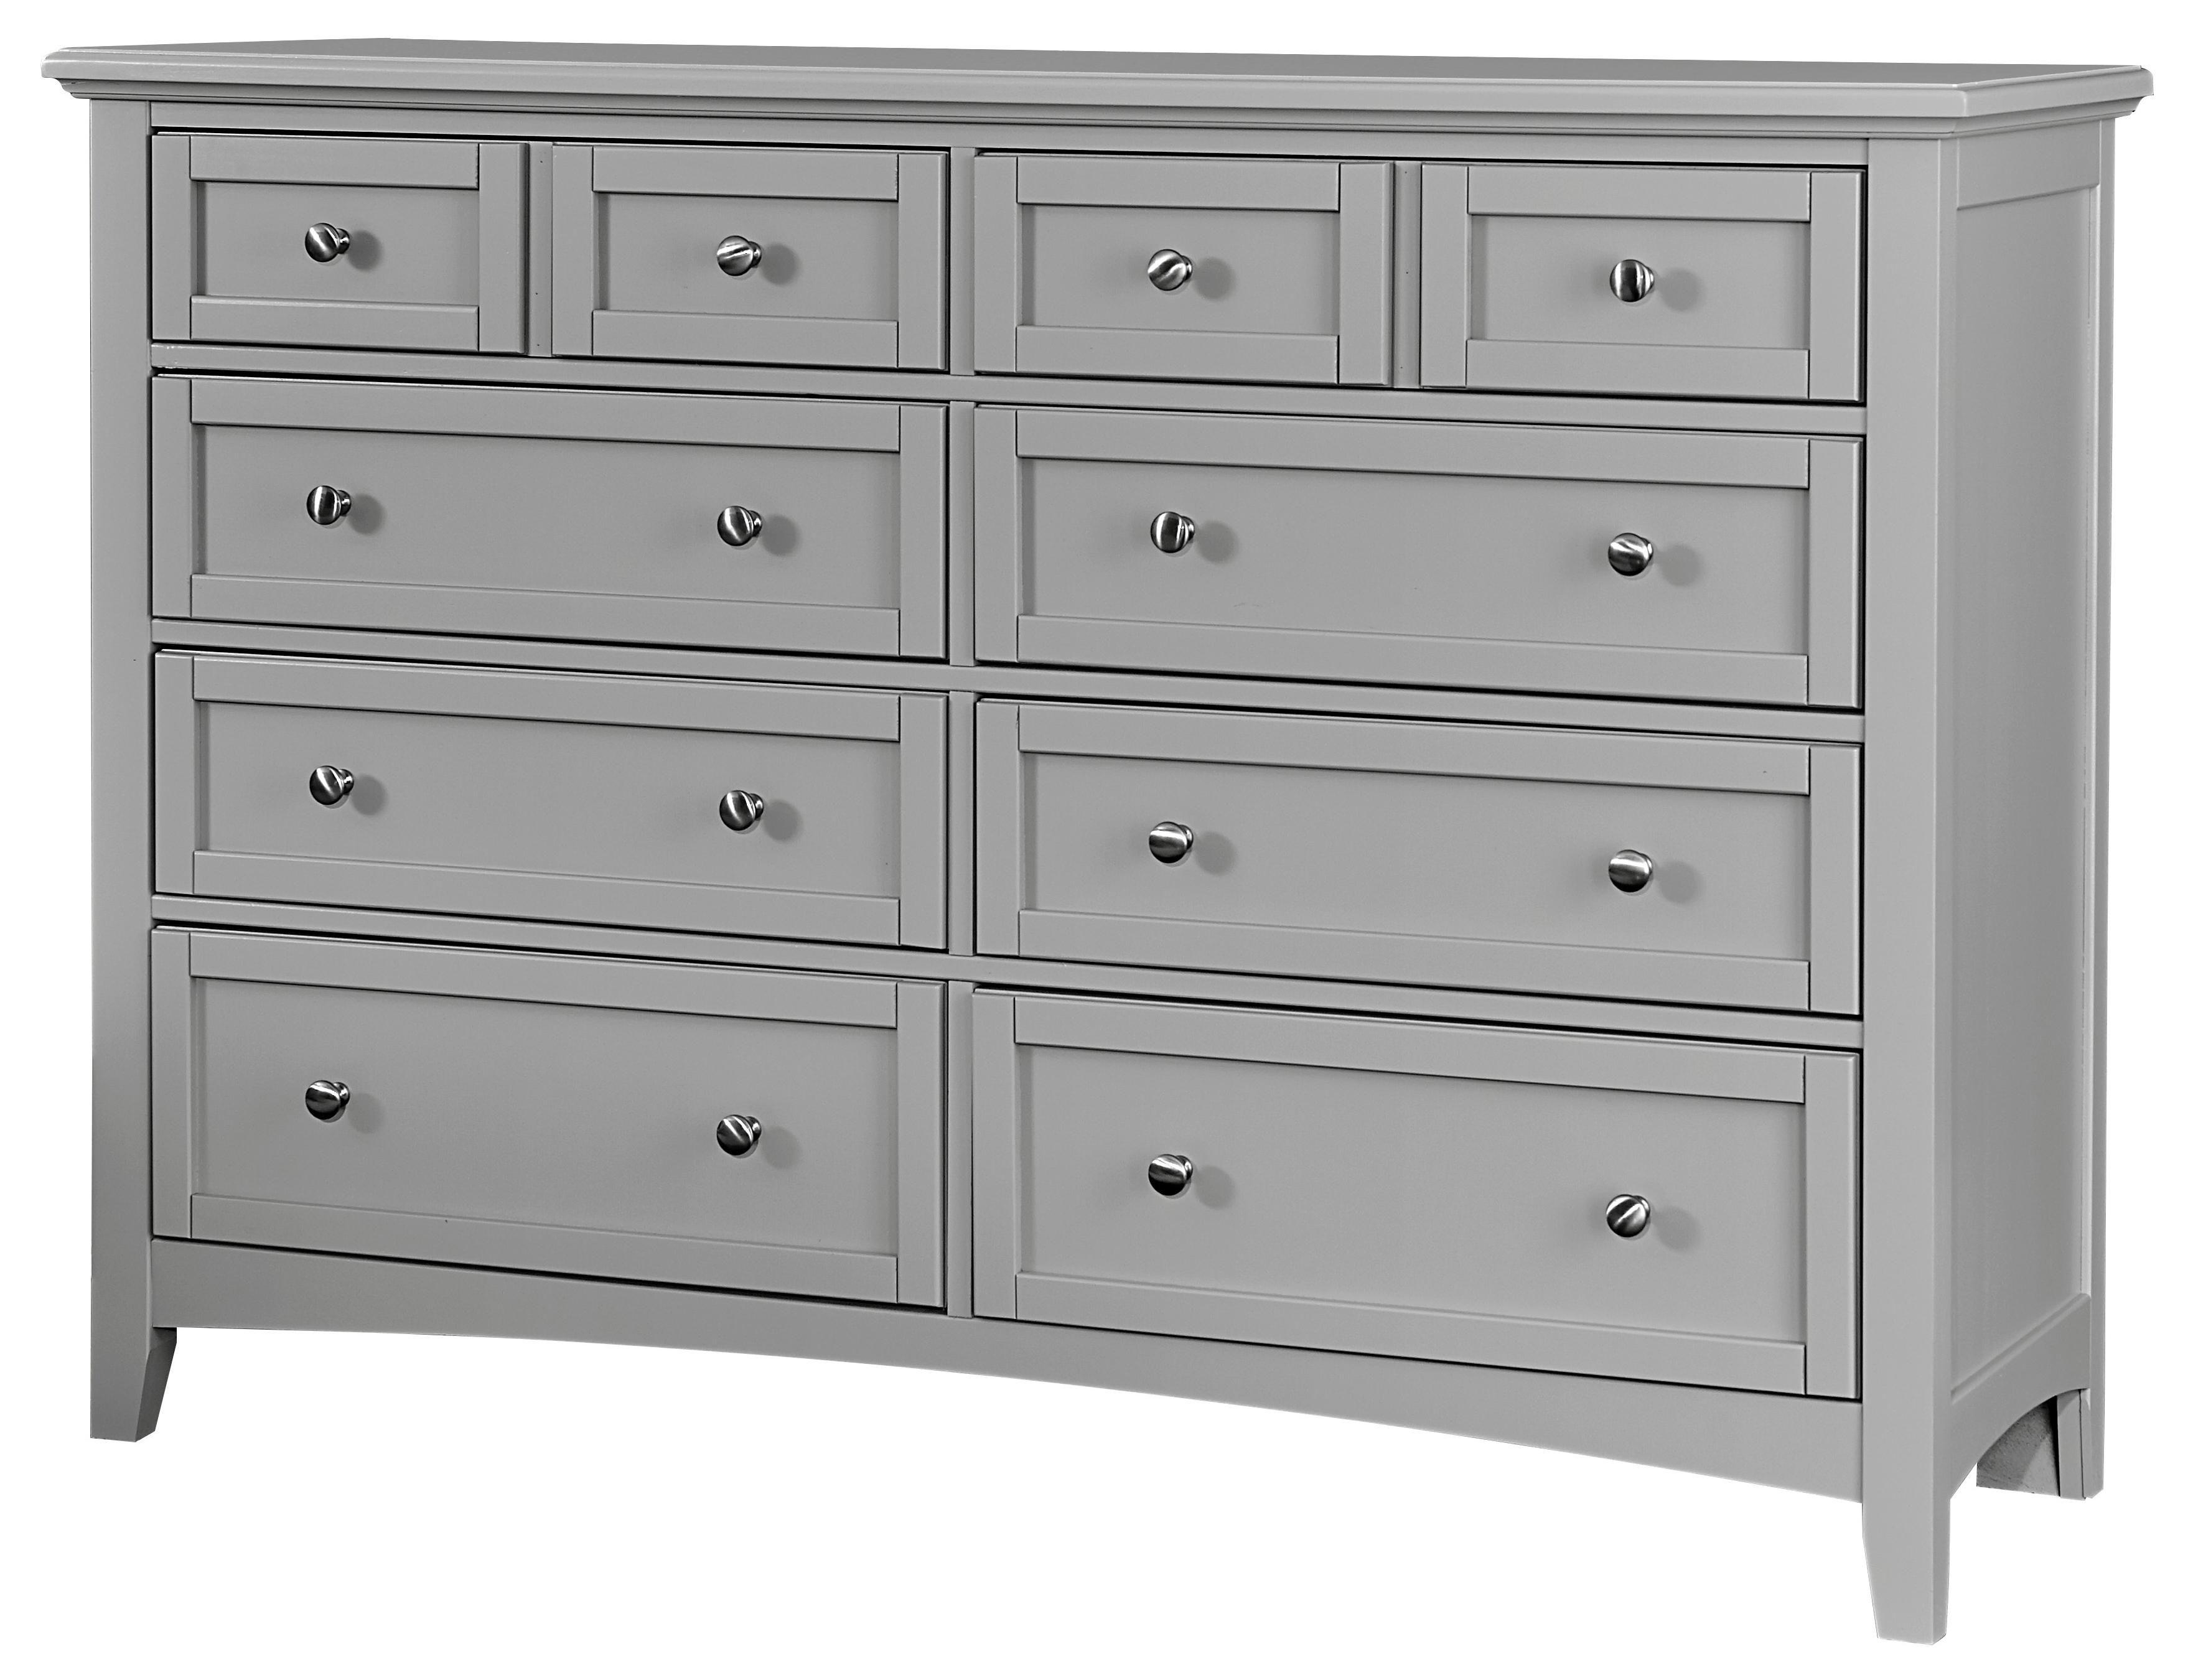 Bonanza triple dresser drawers by vaughan bassett bedroom